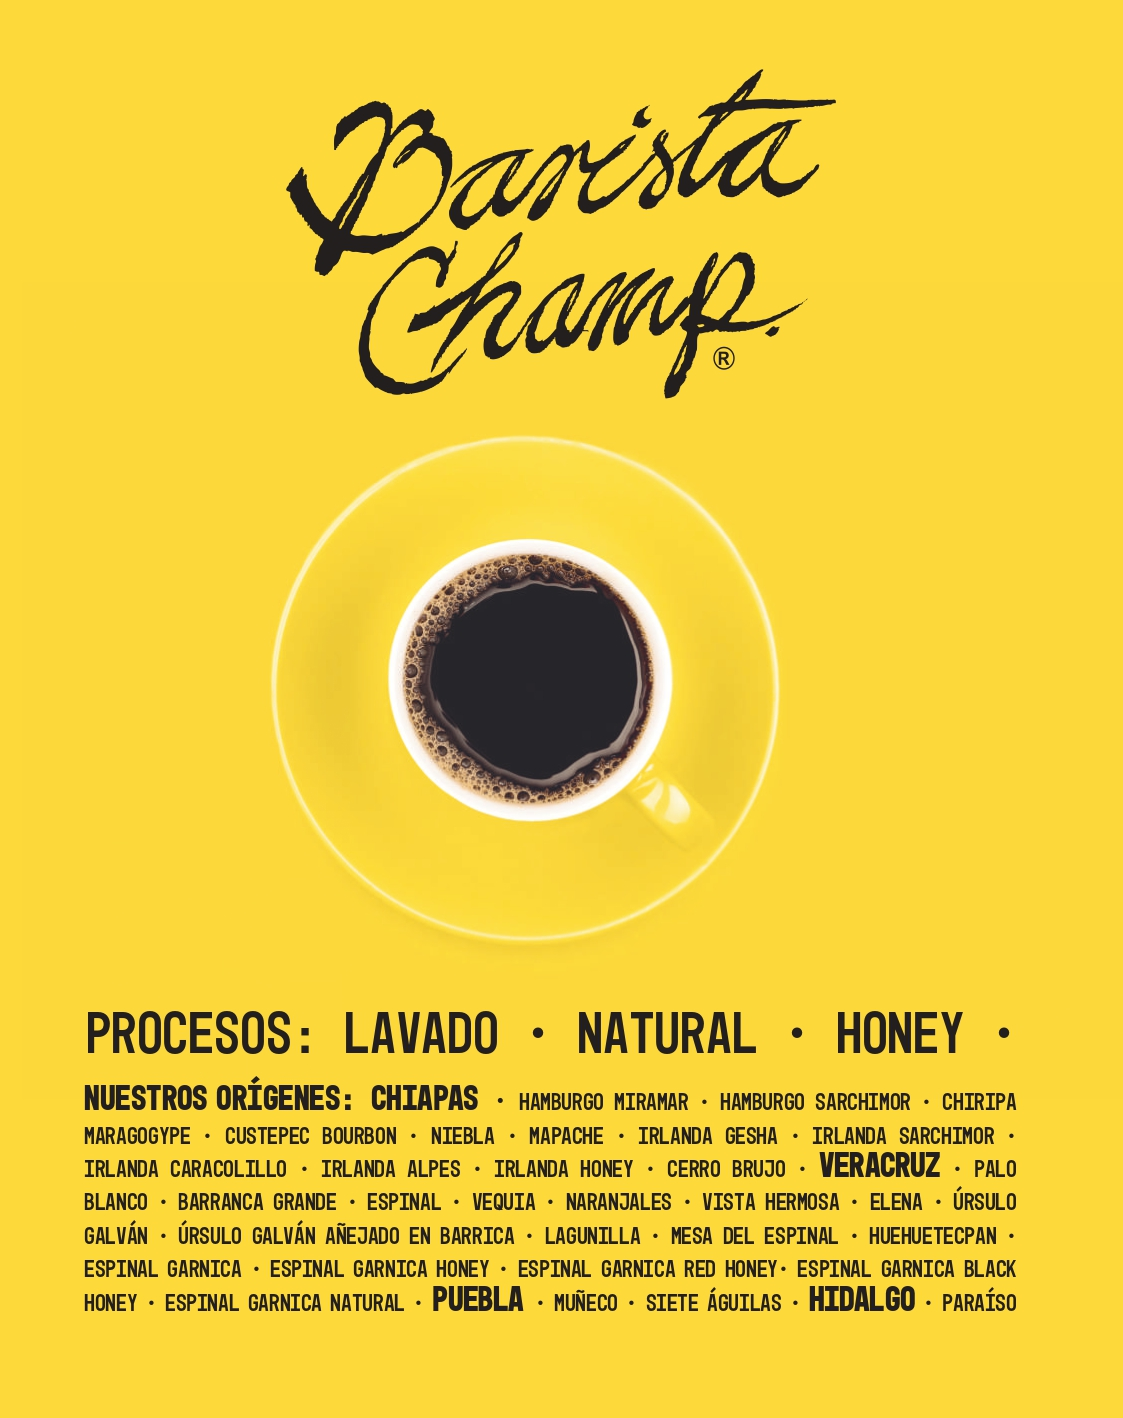 Café de especialidad Barista Champ